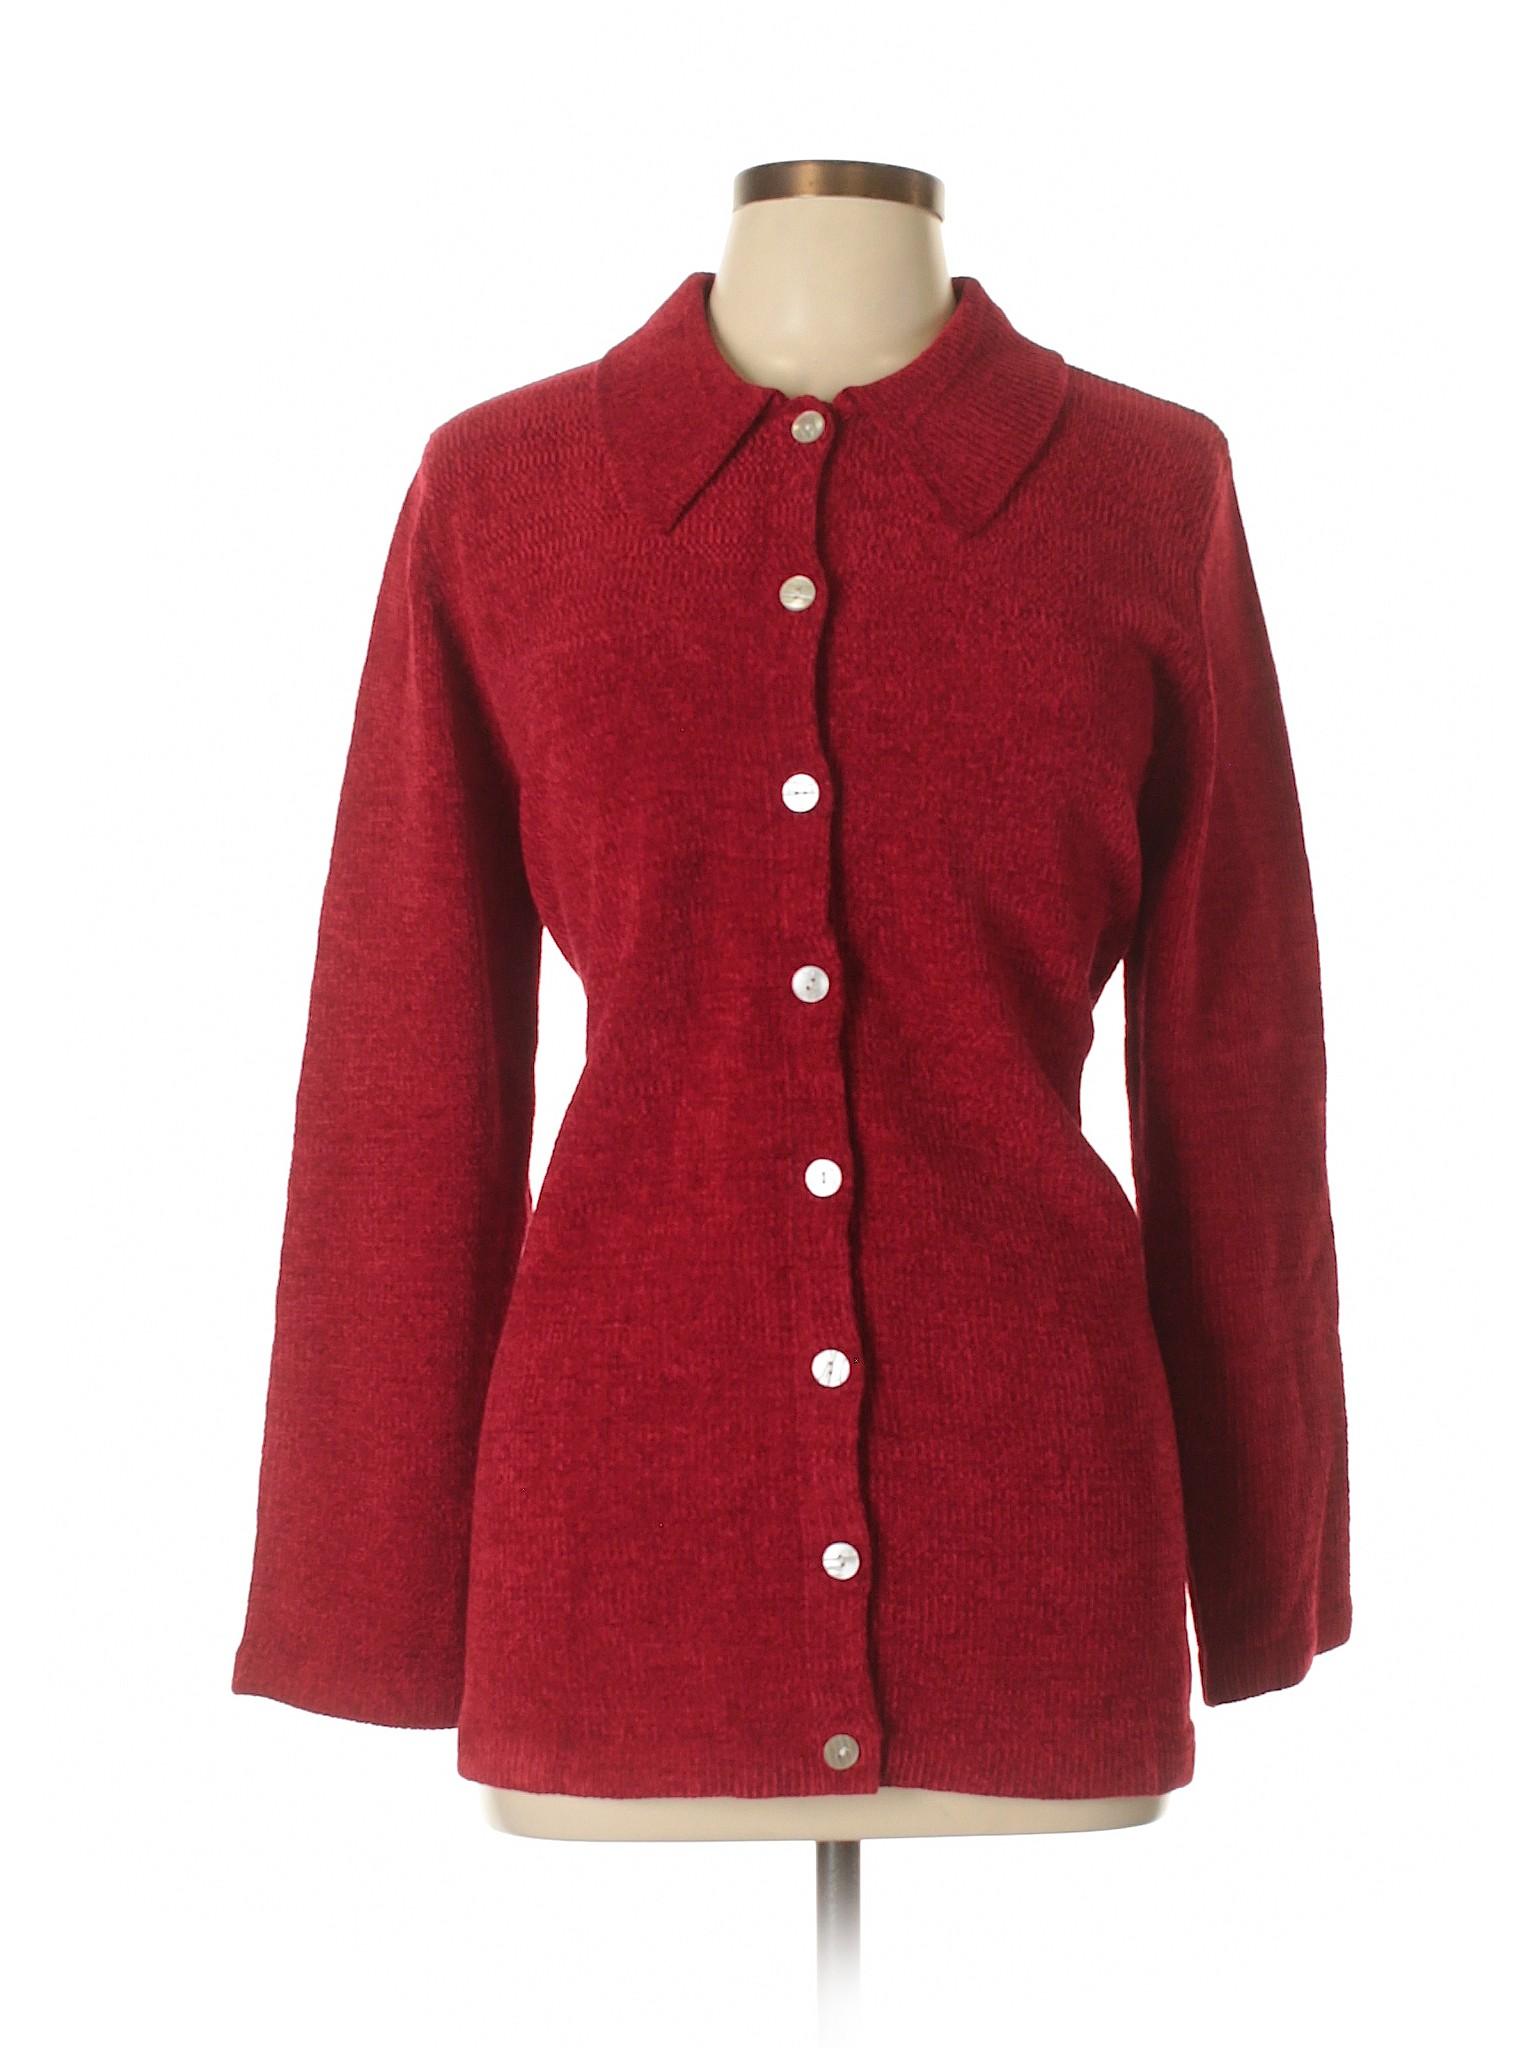 amp; winter Co Jacket Leisure Denim vHTznwg0